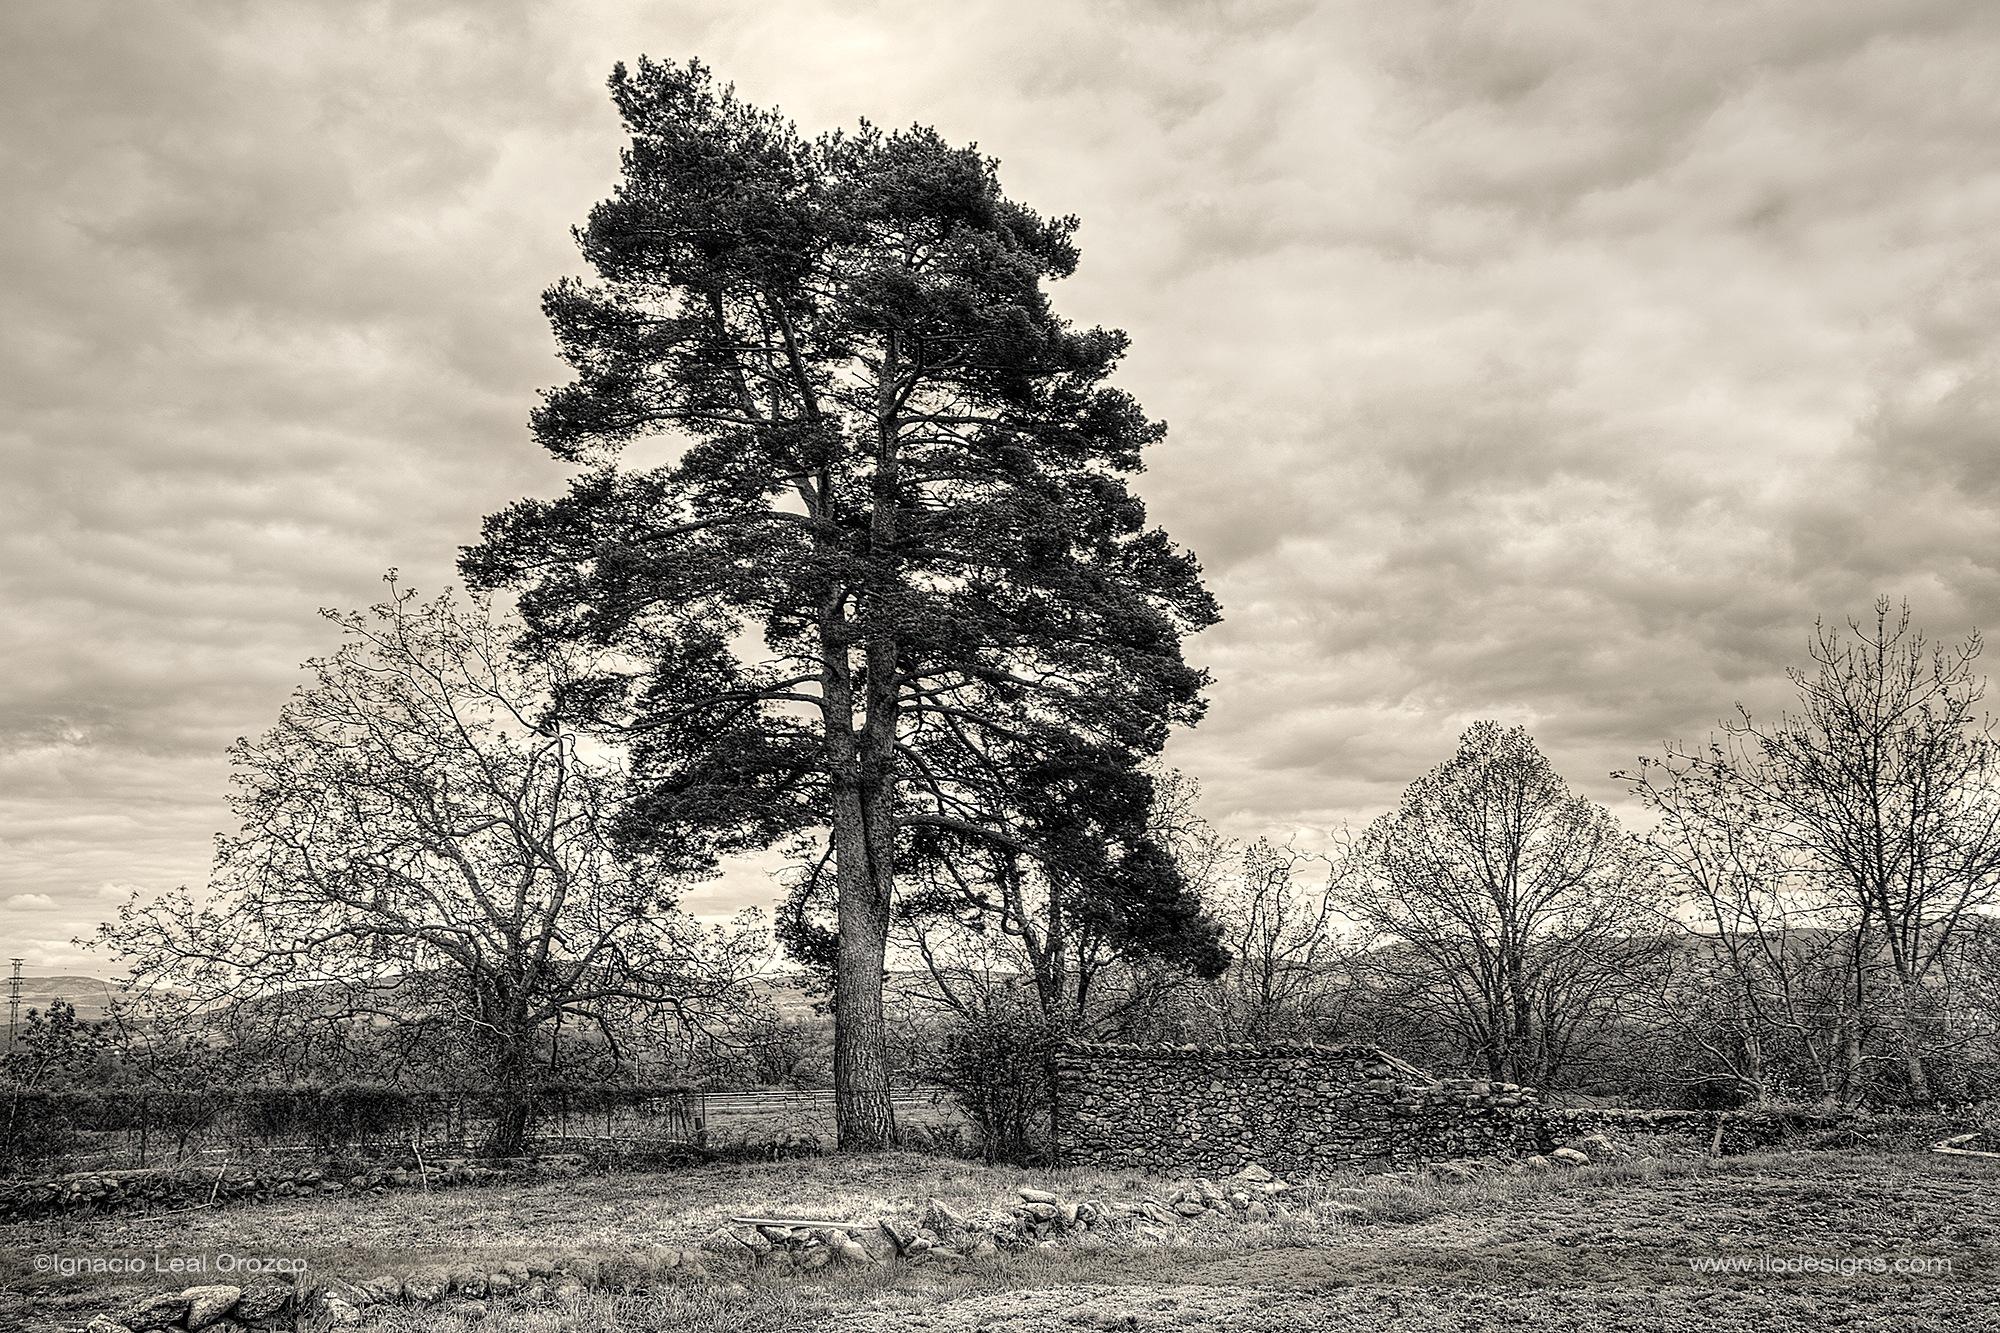 The old pine by Ignacio Leal Orozco